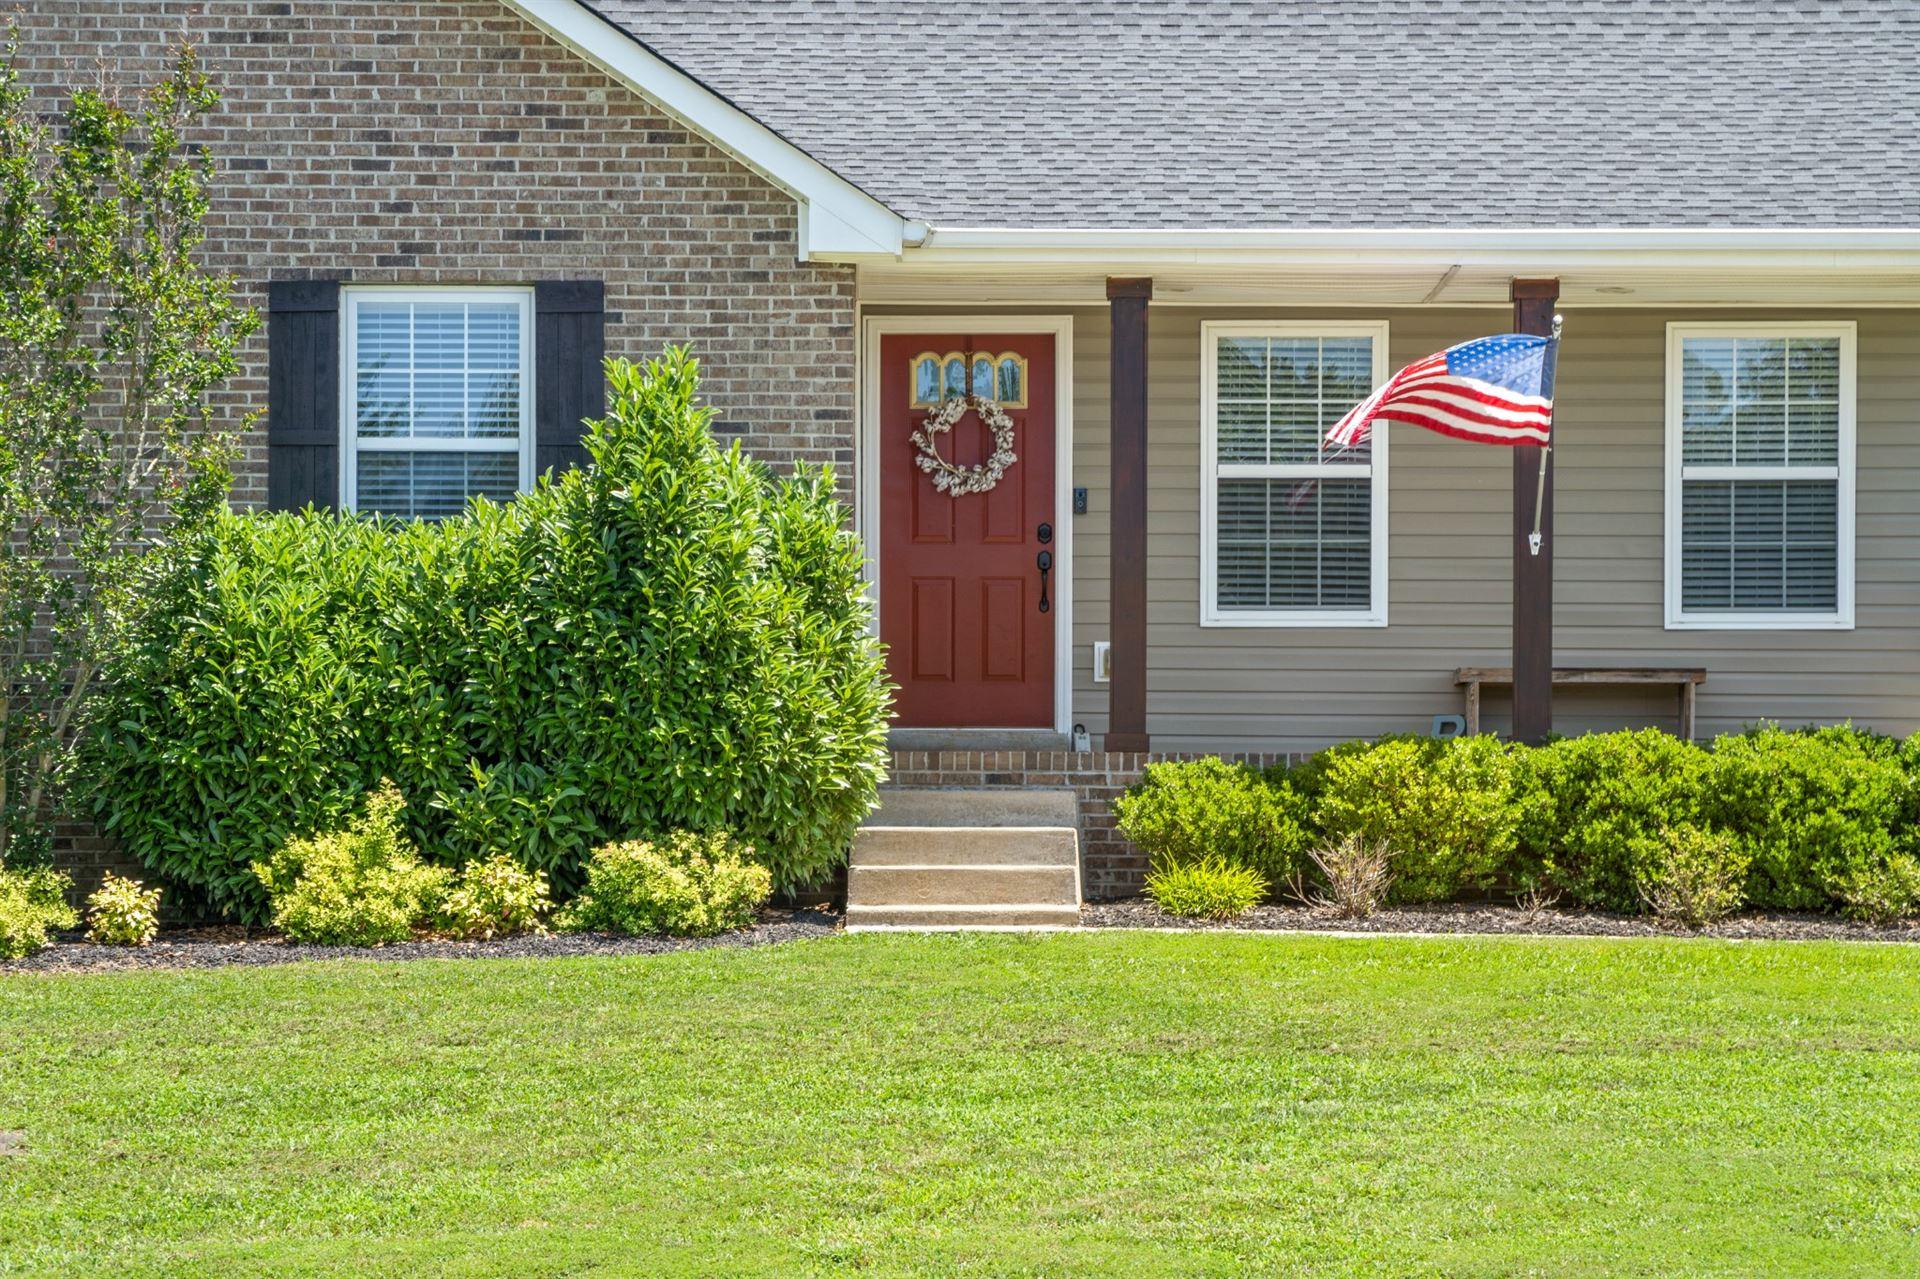 Photo of 3350 Lahna Ct, Clarksville, TN 37043 (MLS # 2168825)